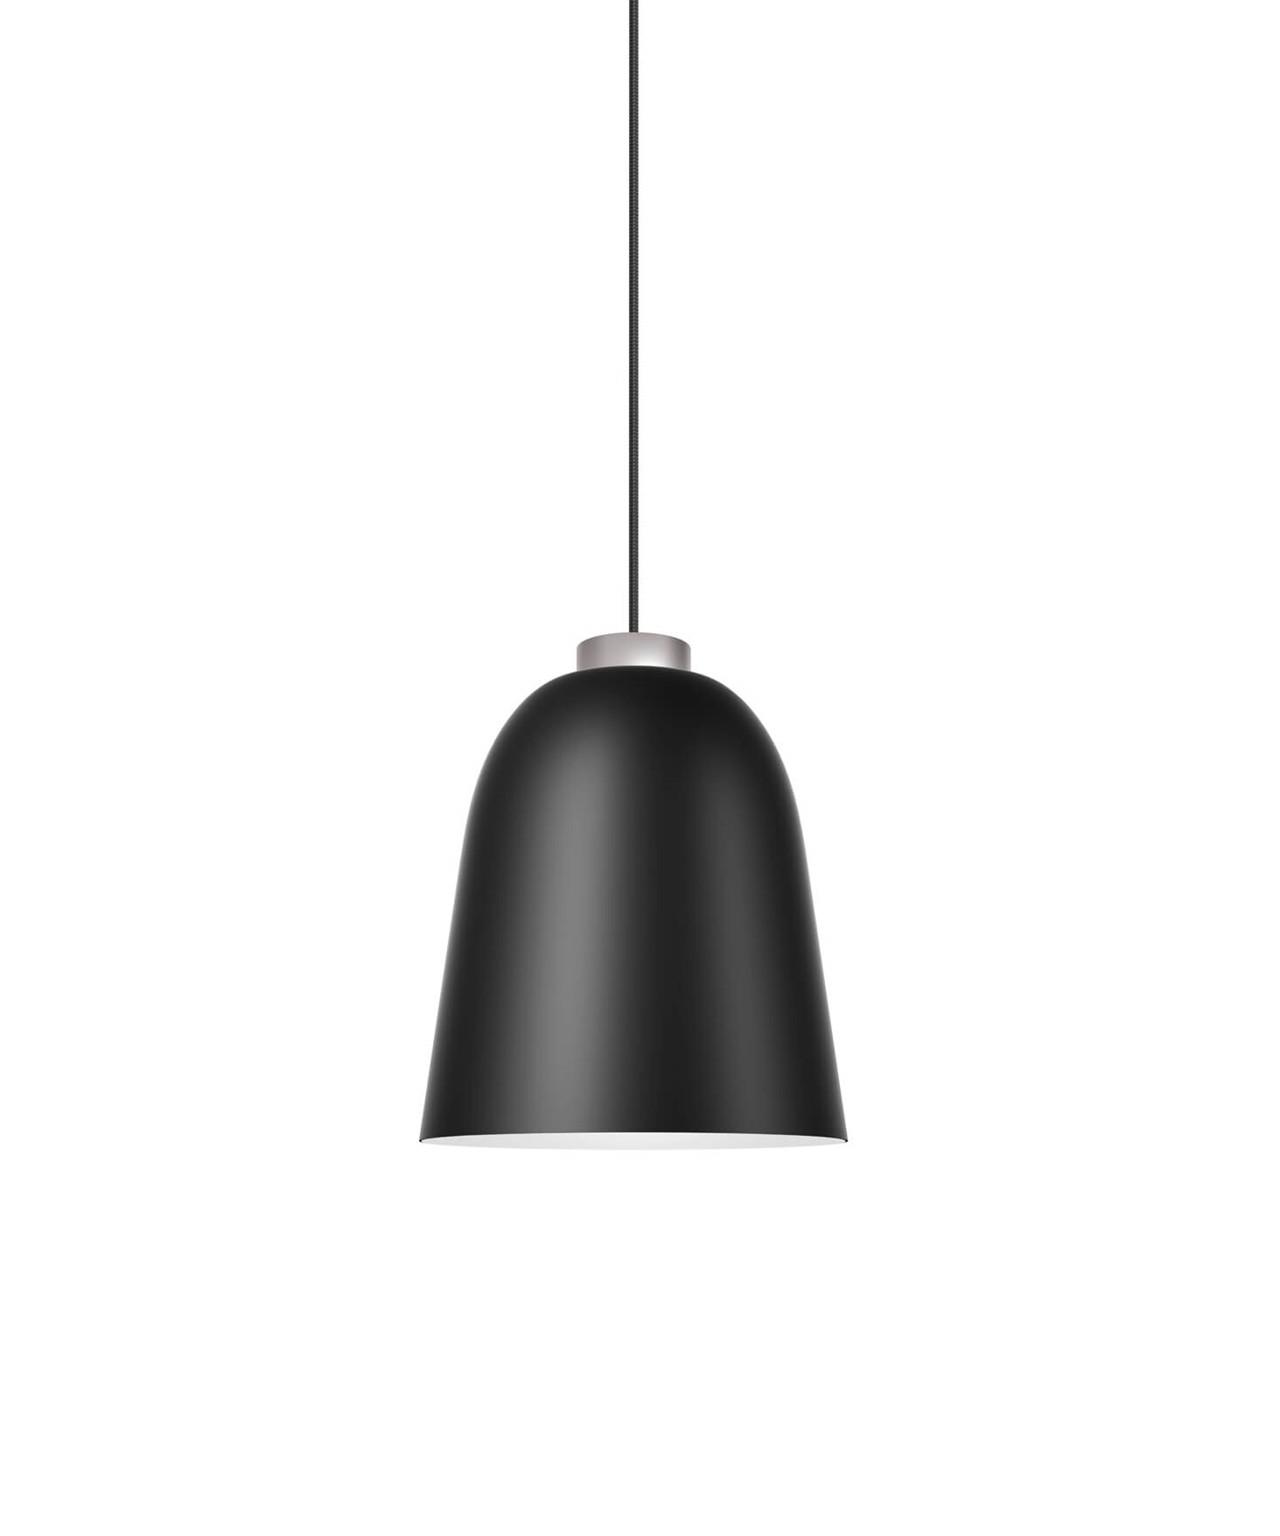 summera pendelleuchte medium matt schwarz silber shapes. Black Bedroom Furniture Sets. Home Design Ideas